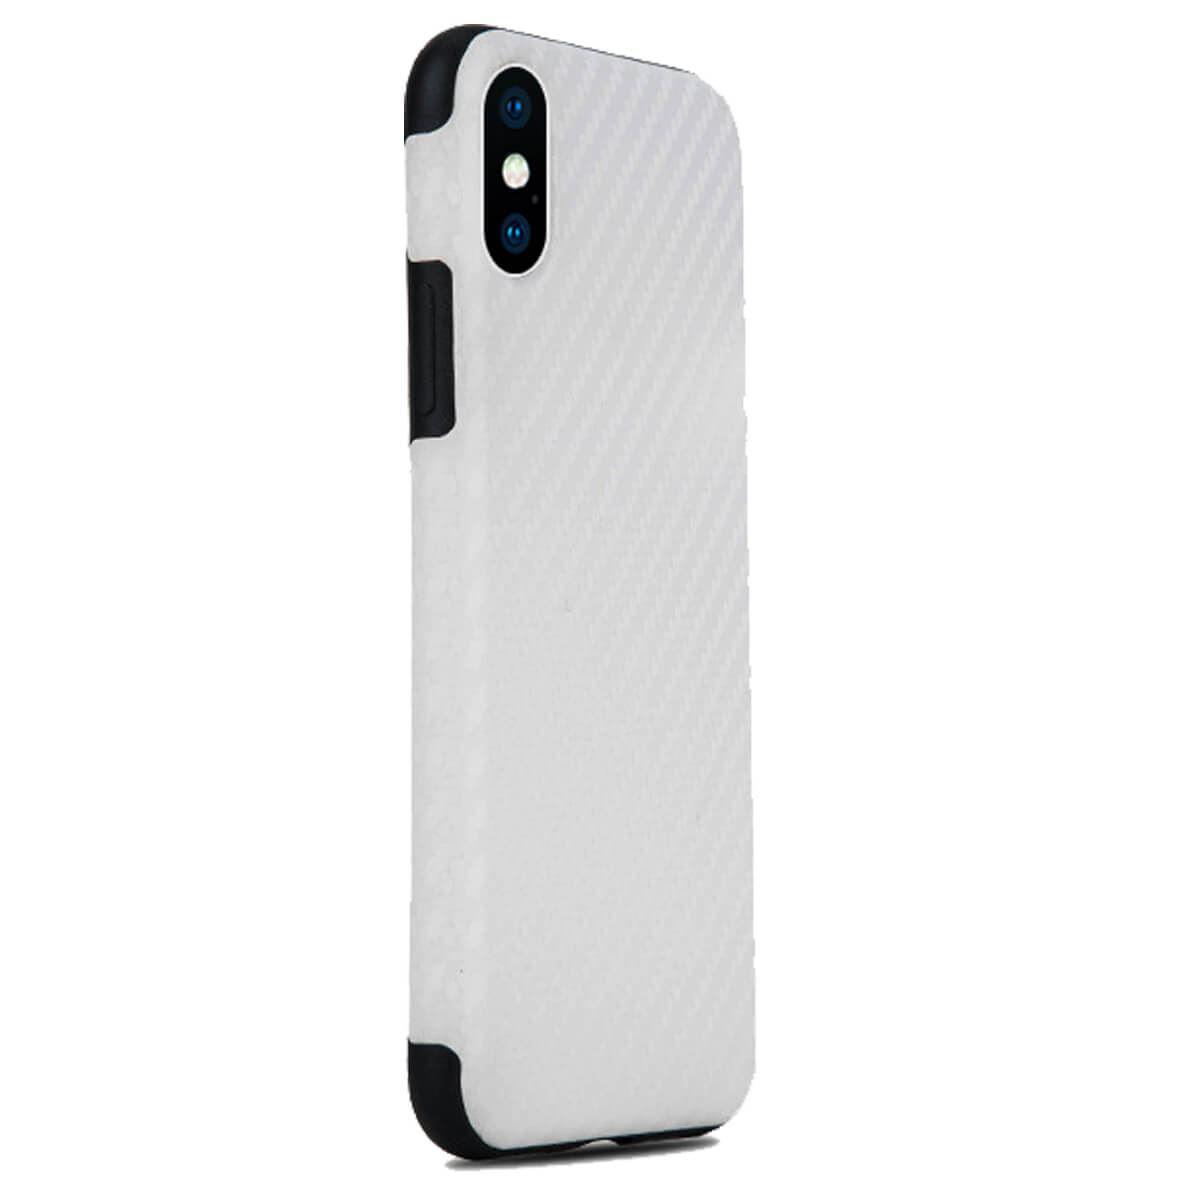 thumbnail 15 - Shockproof Carbon Fibre Case For Apple iPhone 10 X 8 Plus 7 6s Se 5 Thin Cover